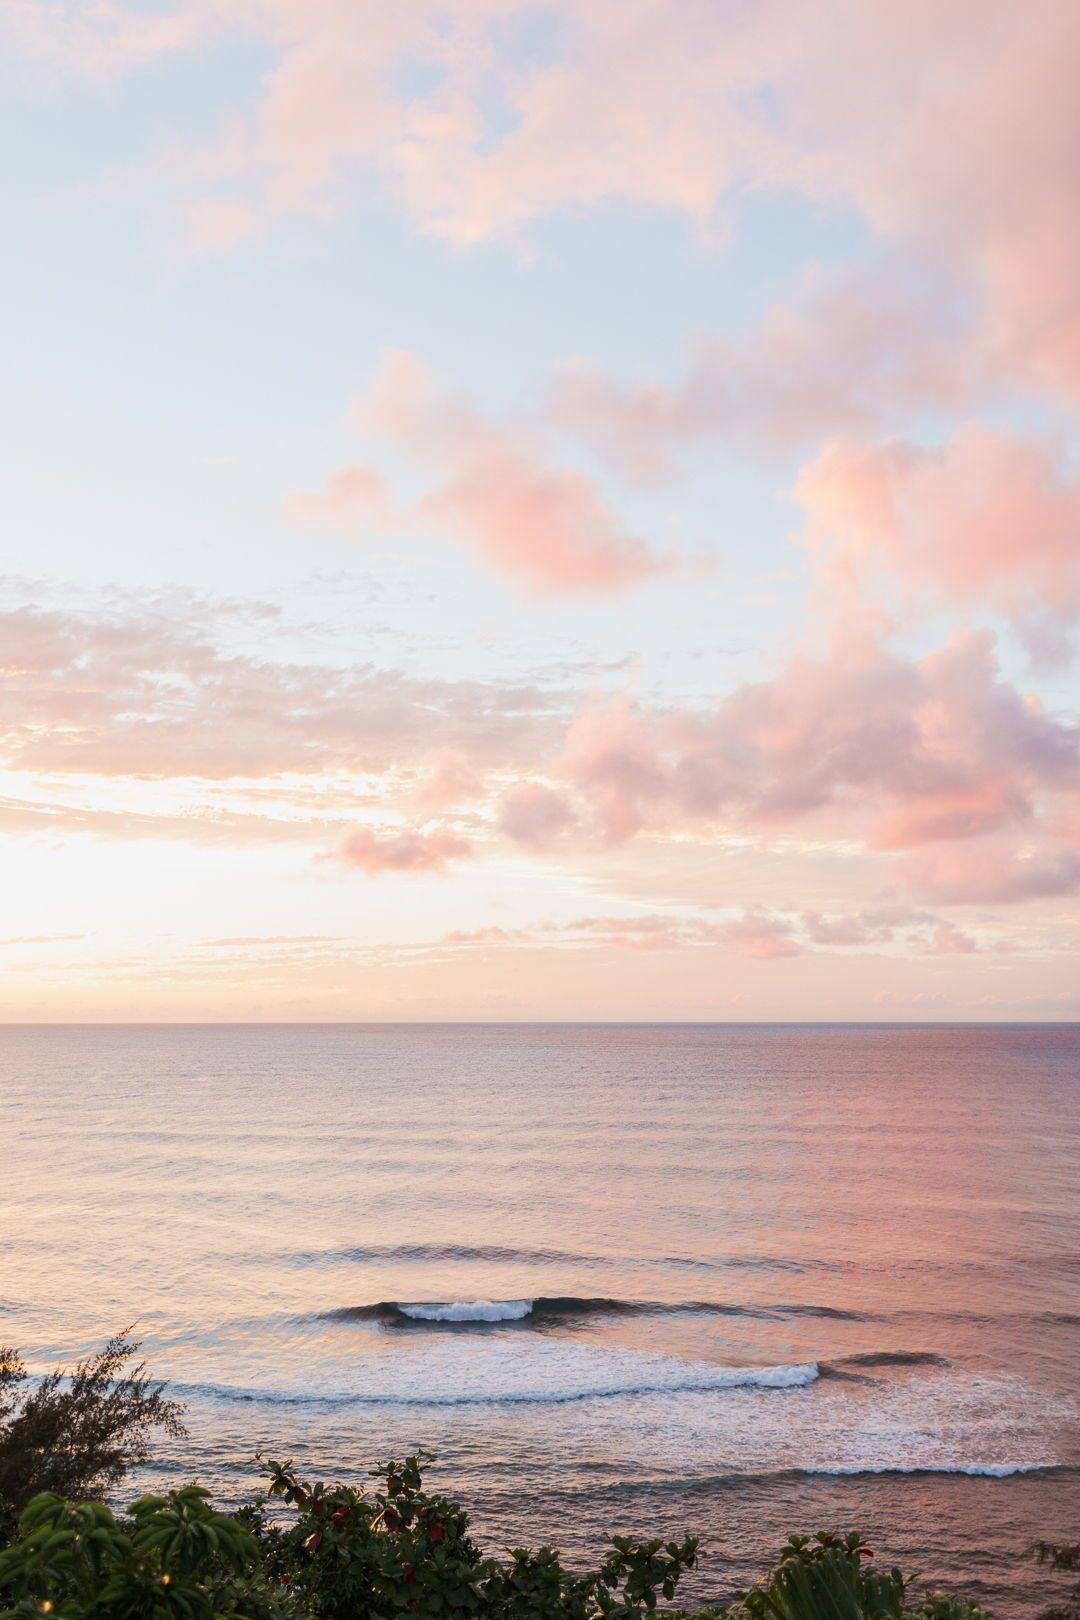 Pacific Ocean Pink Sunset View On Kauai Hawaii Photographers Photo By Sea Light Studios